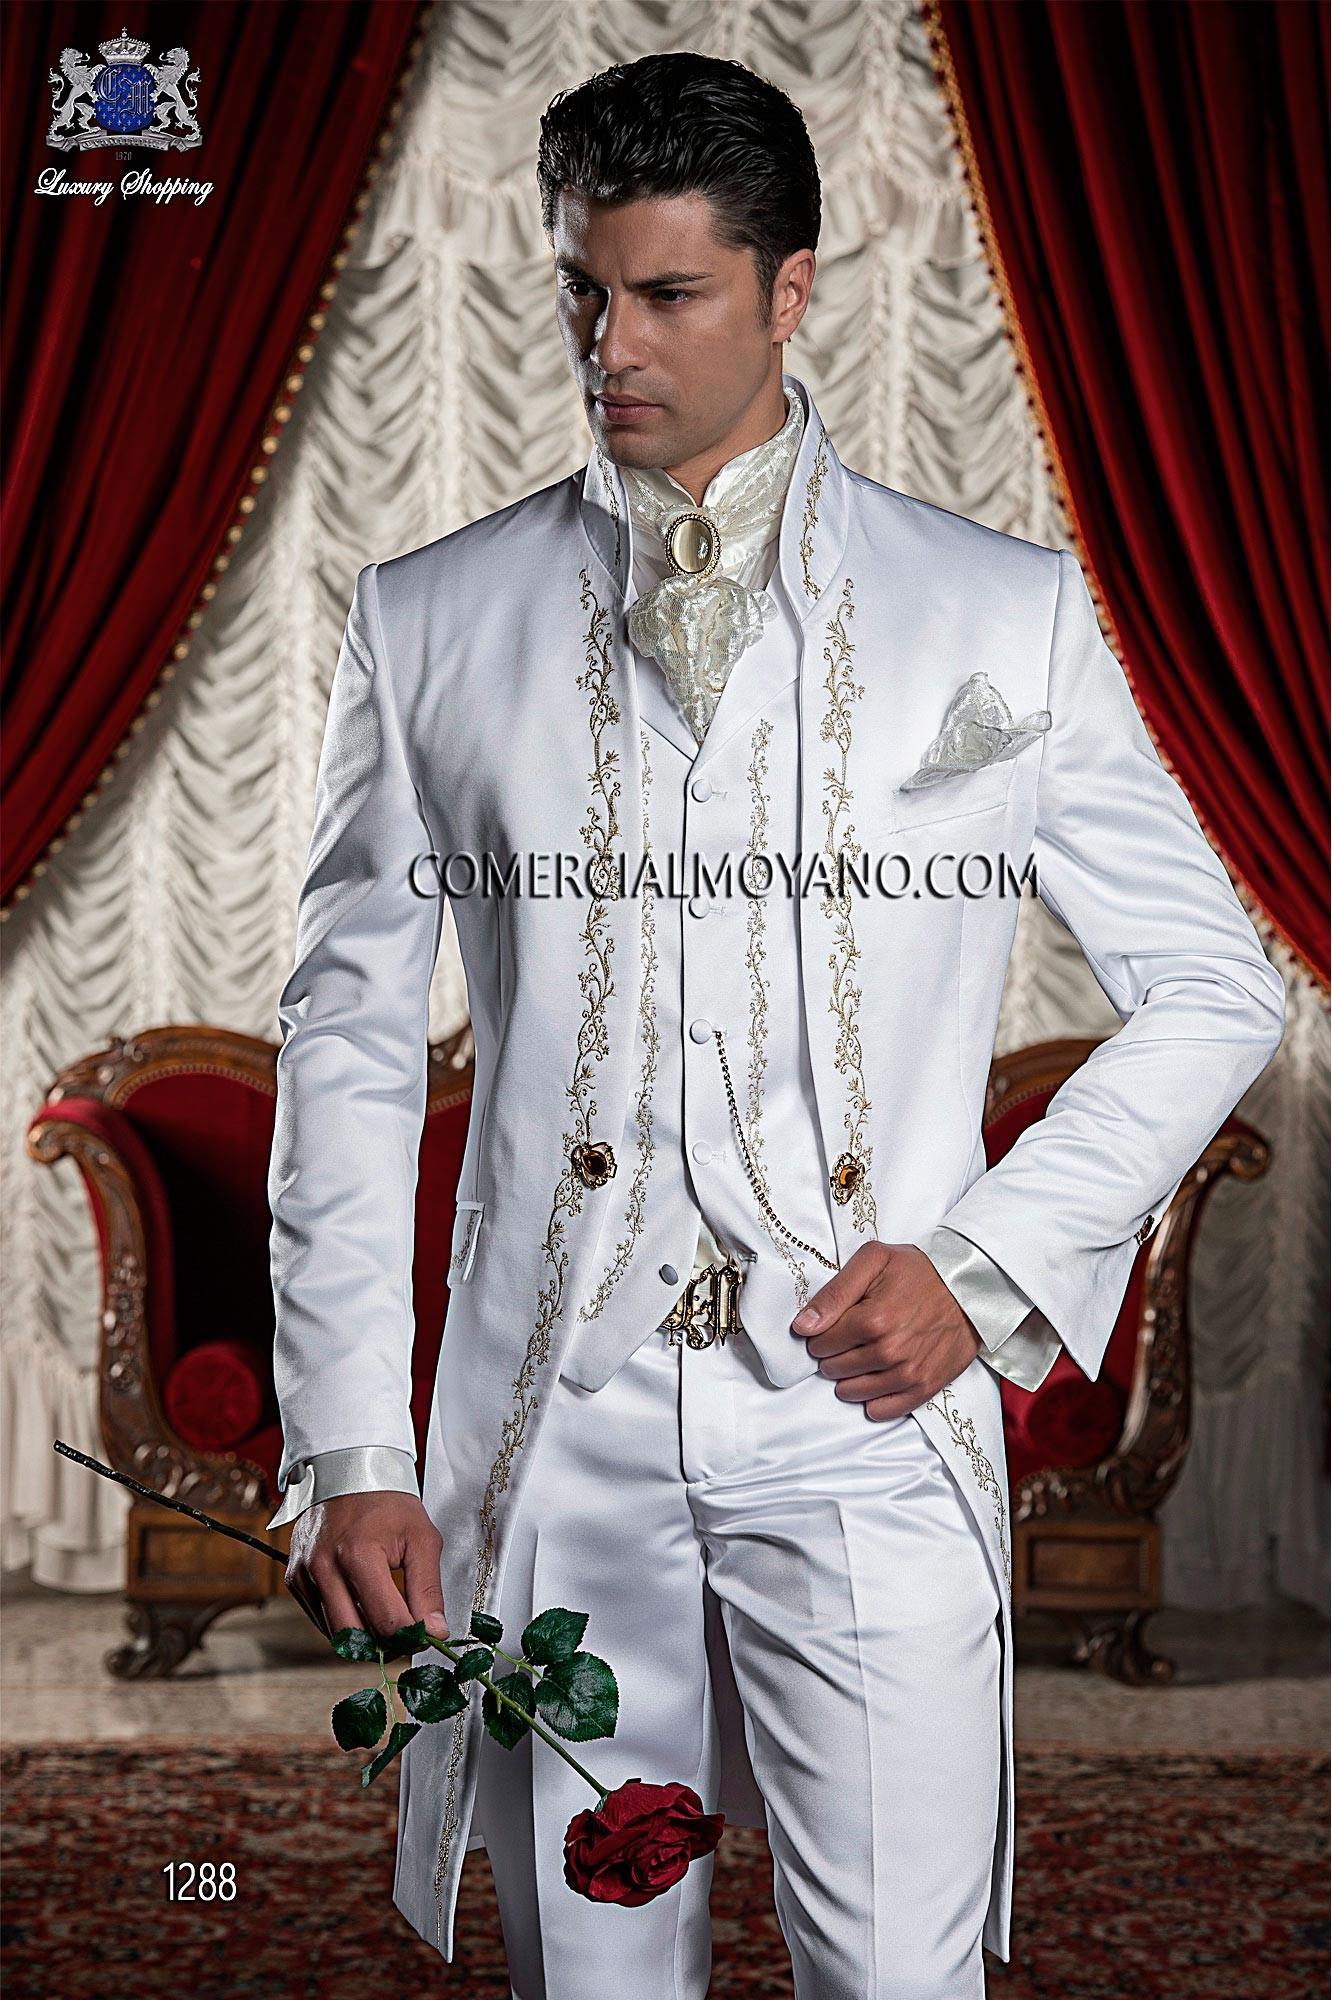 Slikovnica - Page 15 Italian-white-wedding-suit